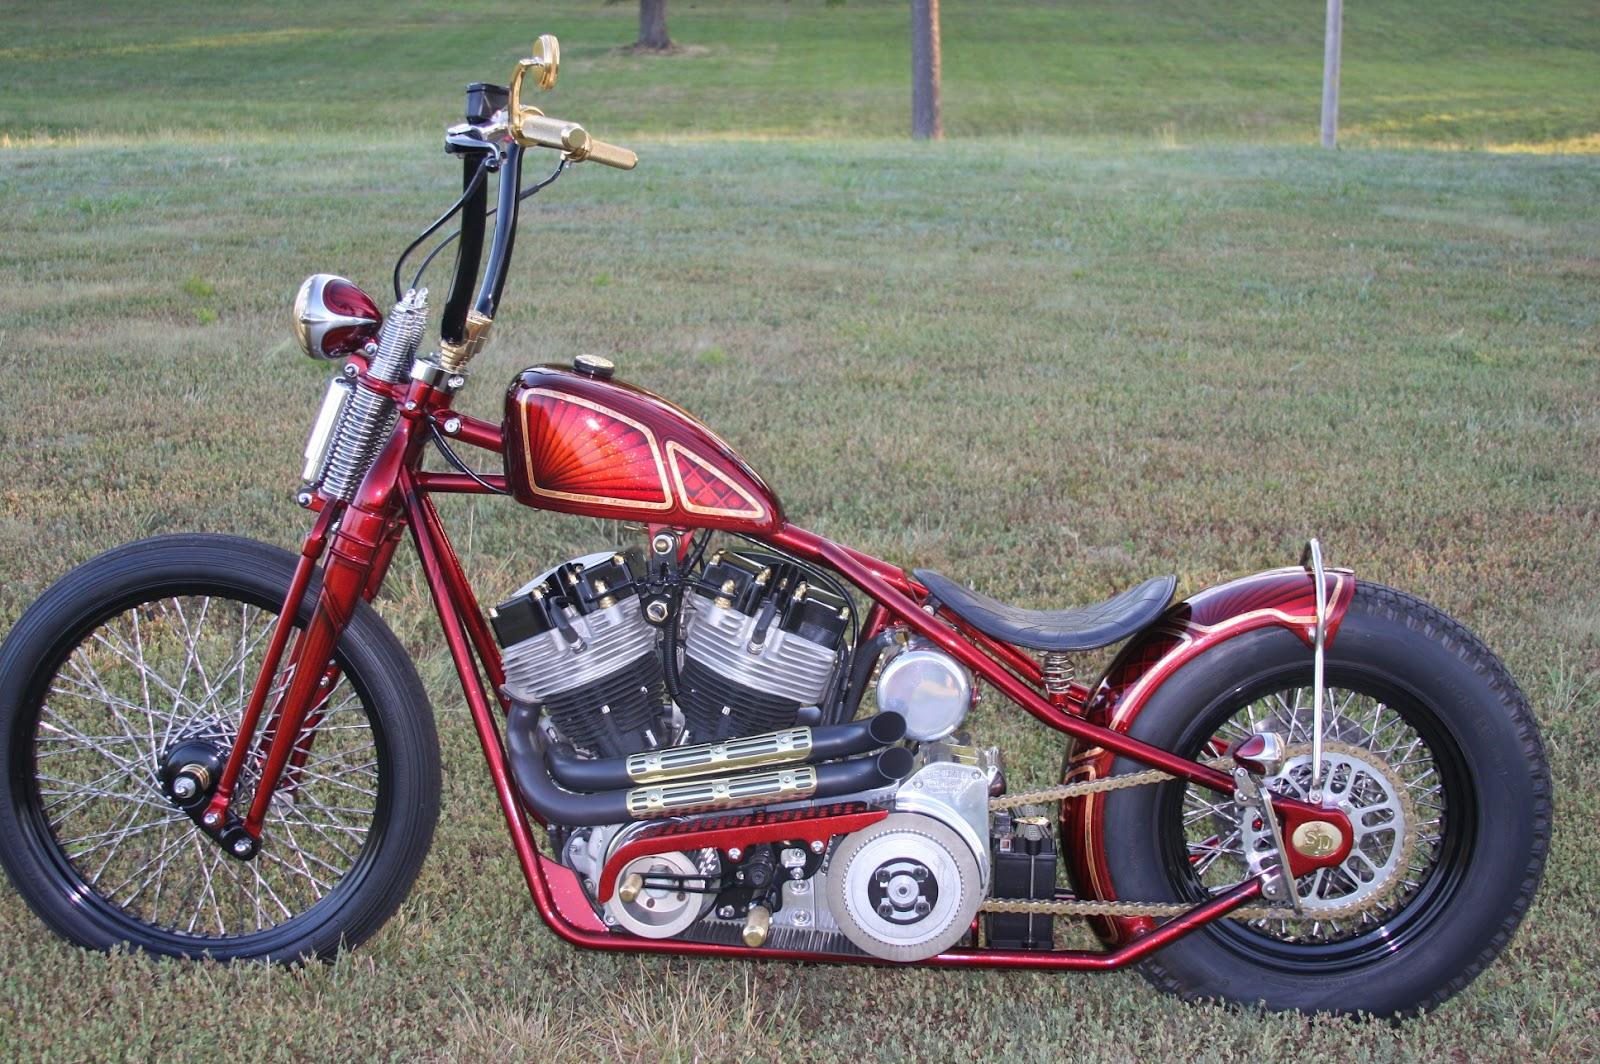 Harley Softail Bobber Parts | Motorjdi.co